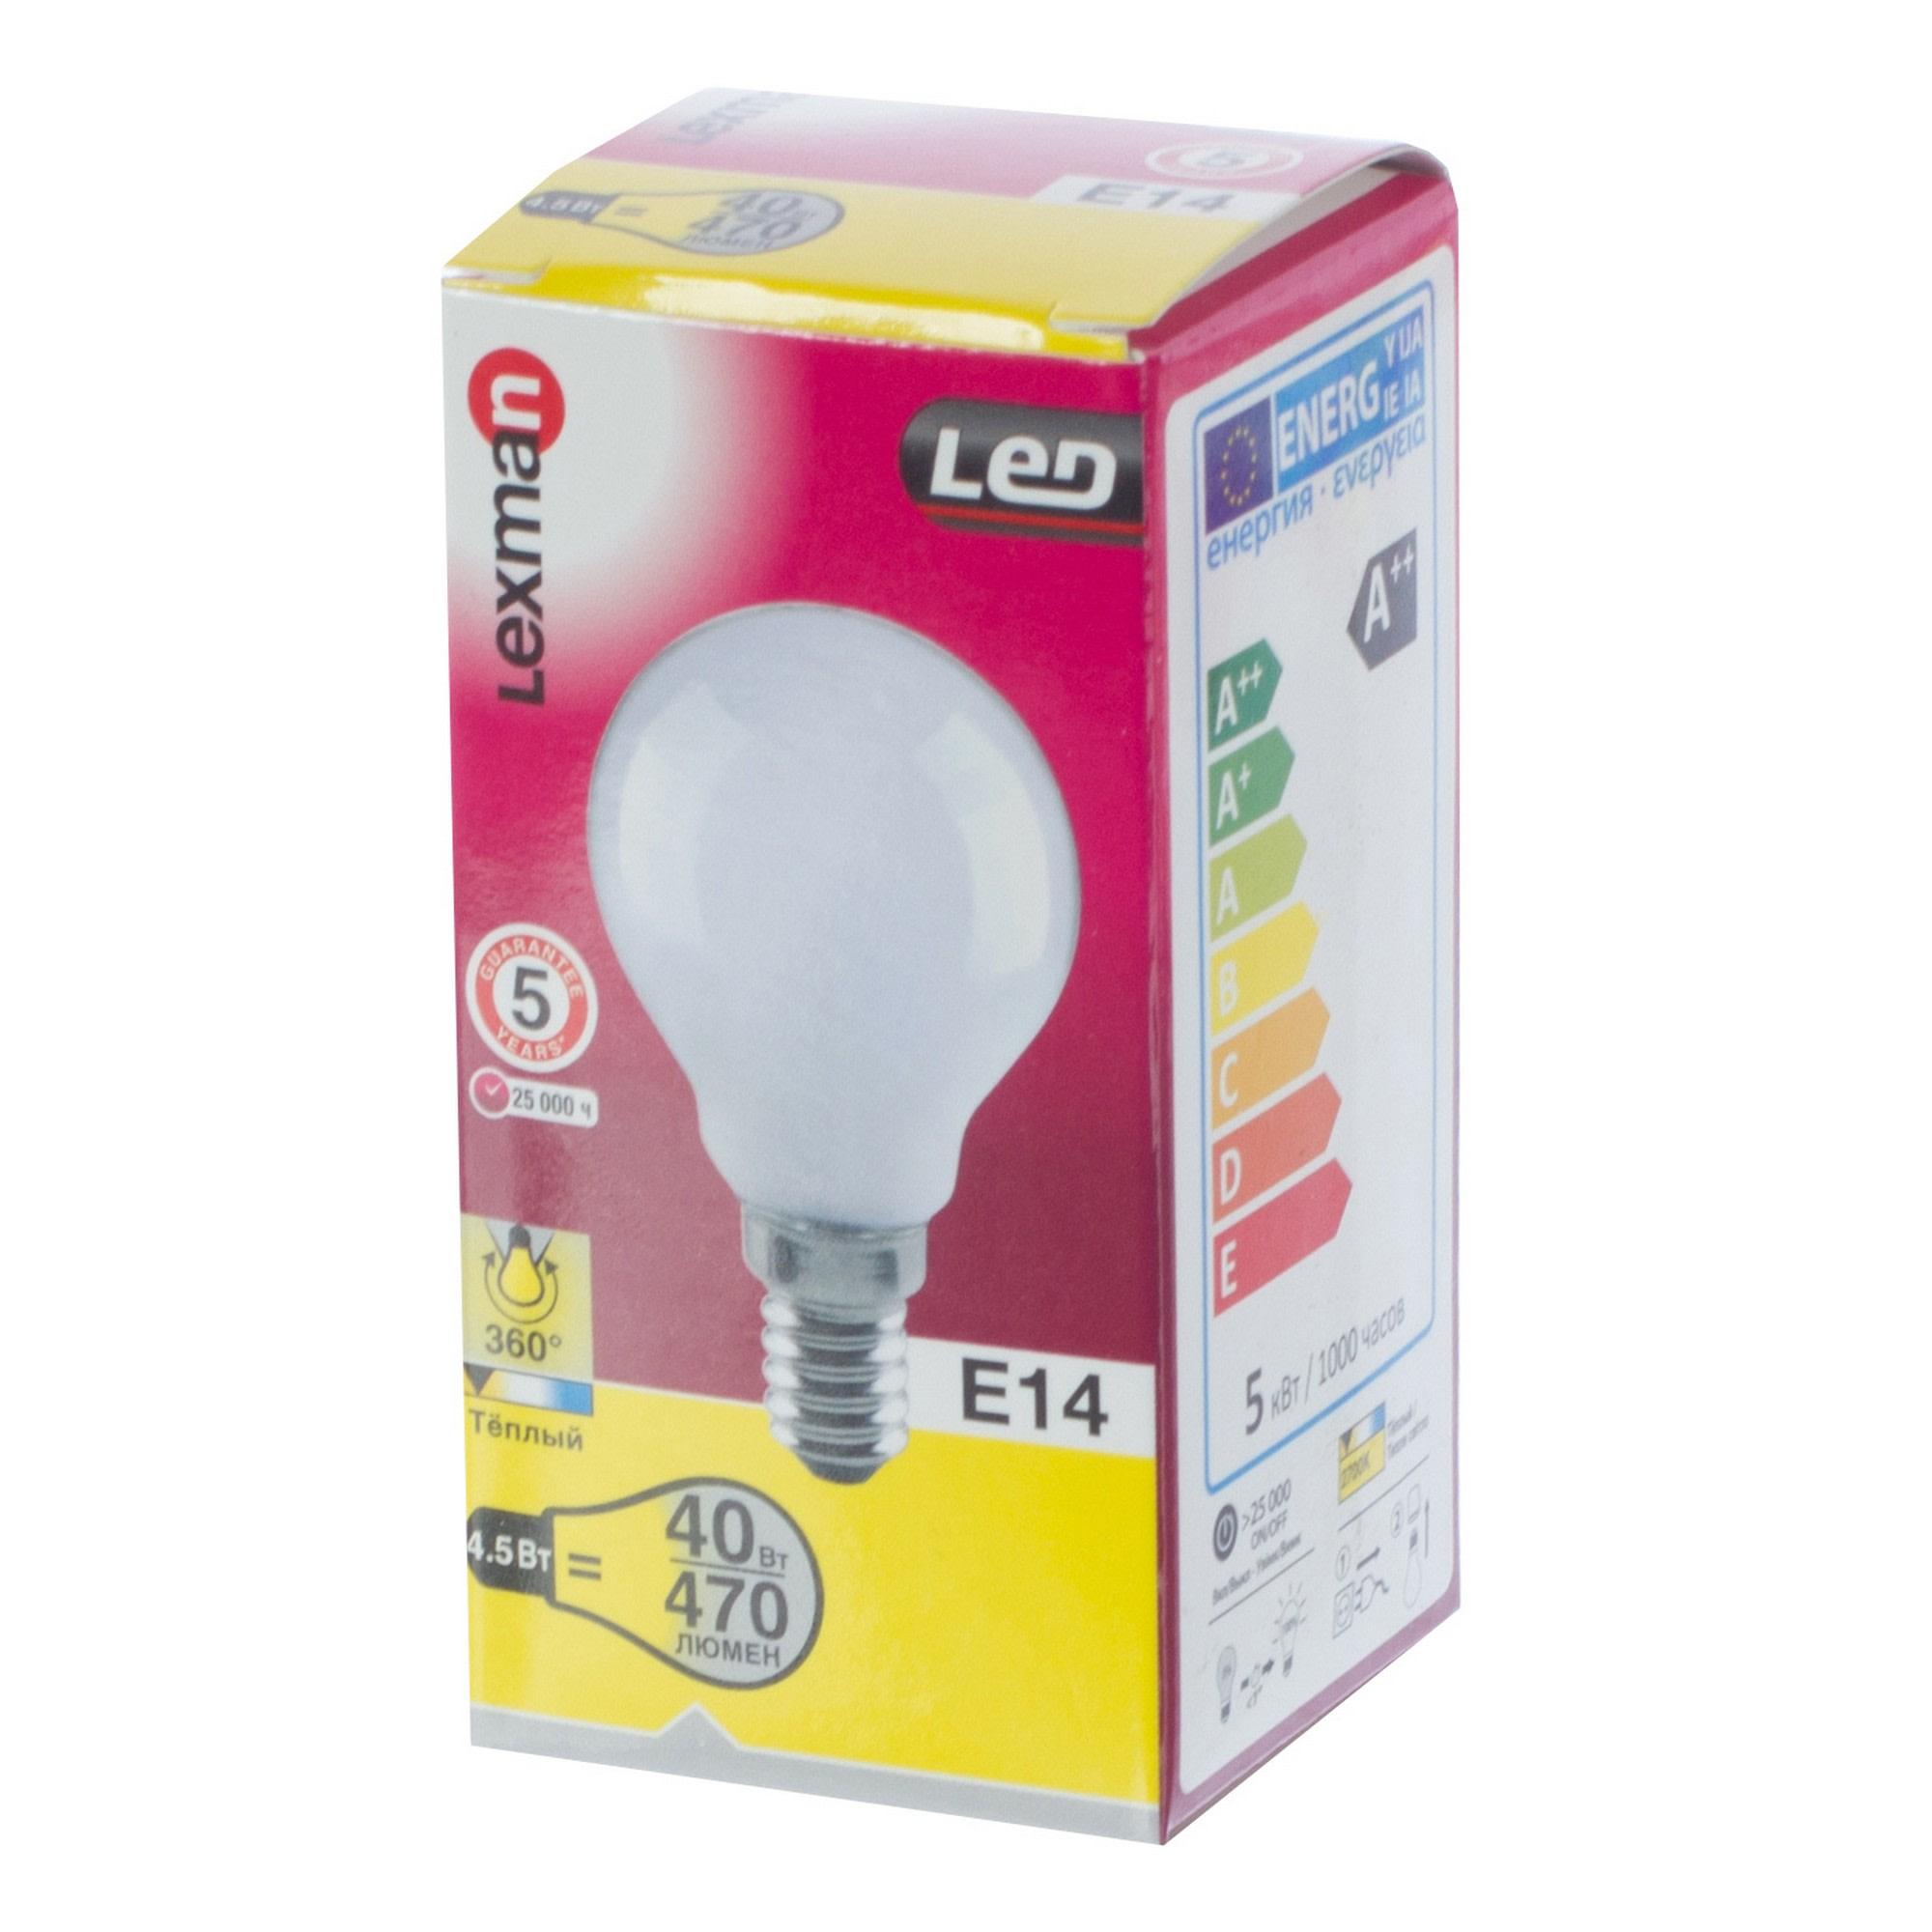 Лампа светодиодная Lexman «Шар» E14 4.5 Вт 470 Лм свет тёплый белый